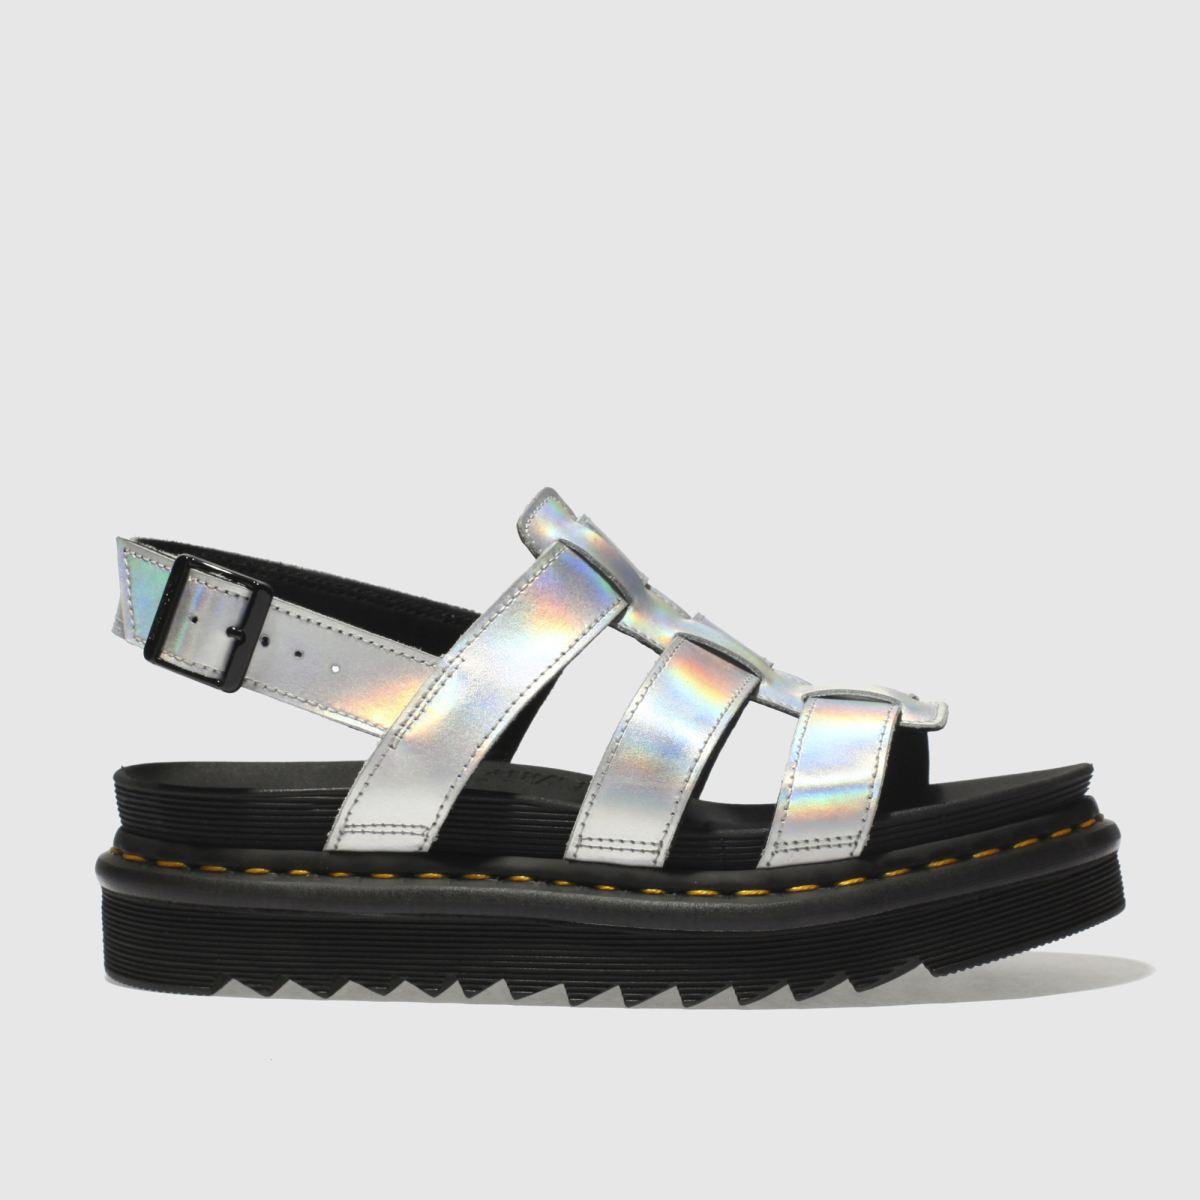 Dr Martens Silver Zebrilus Yelena Iced Metallic Sandals